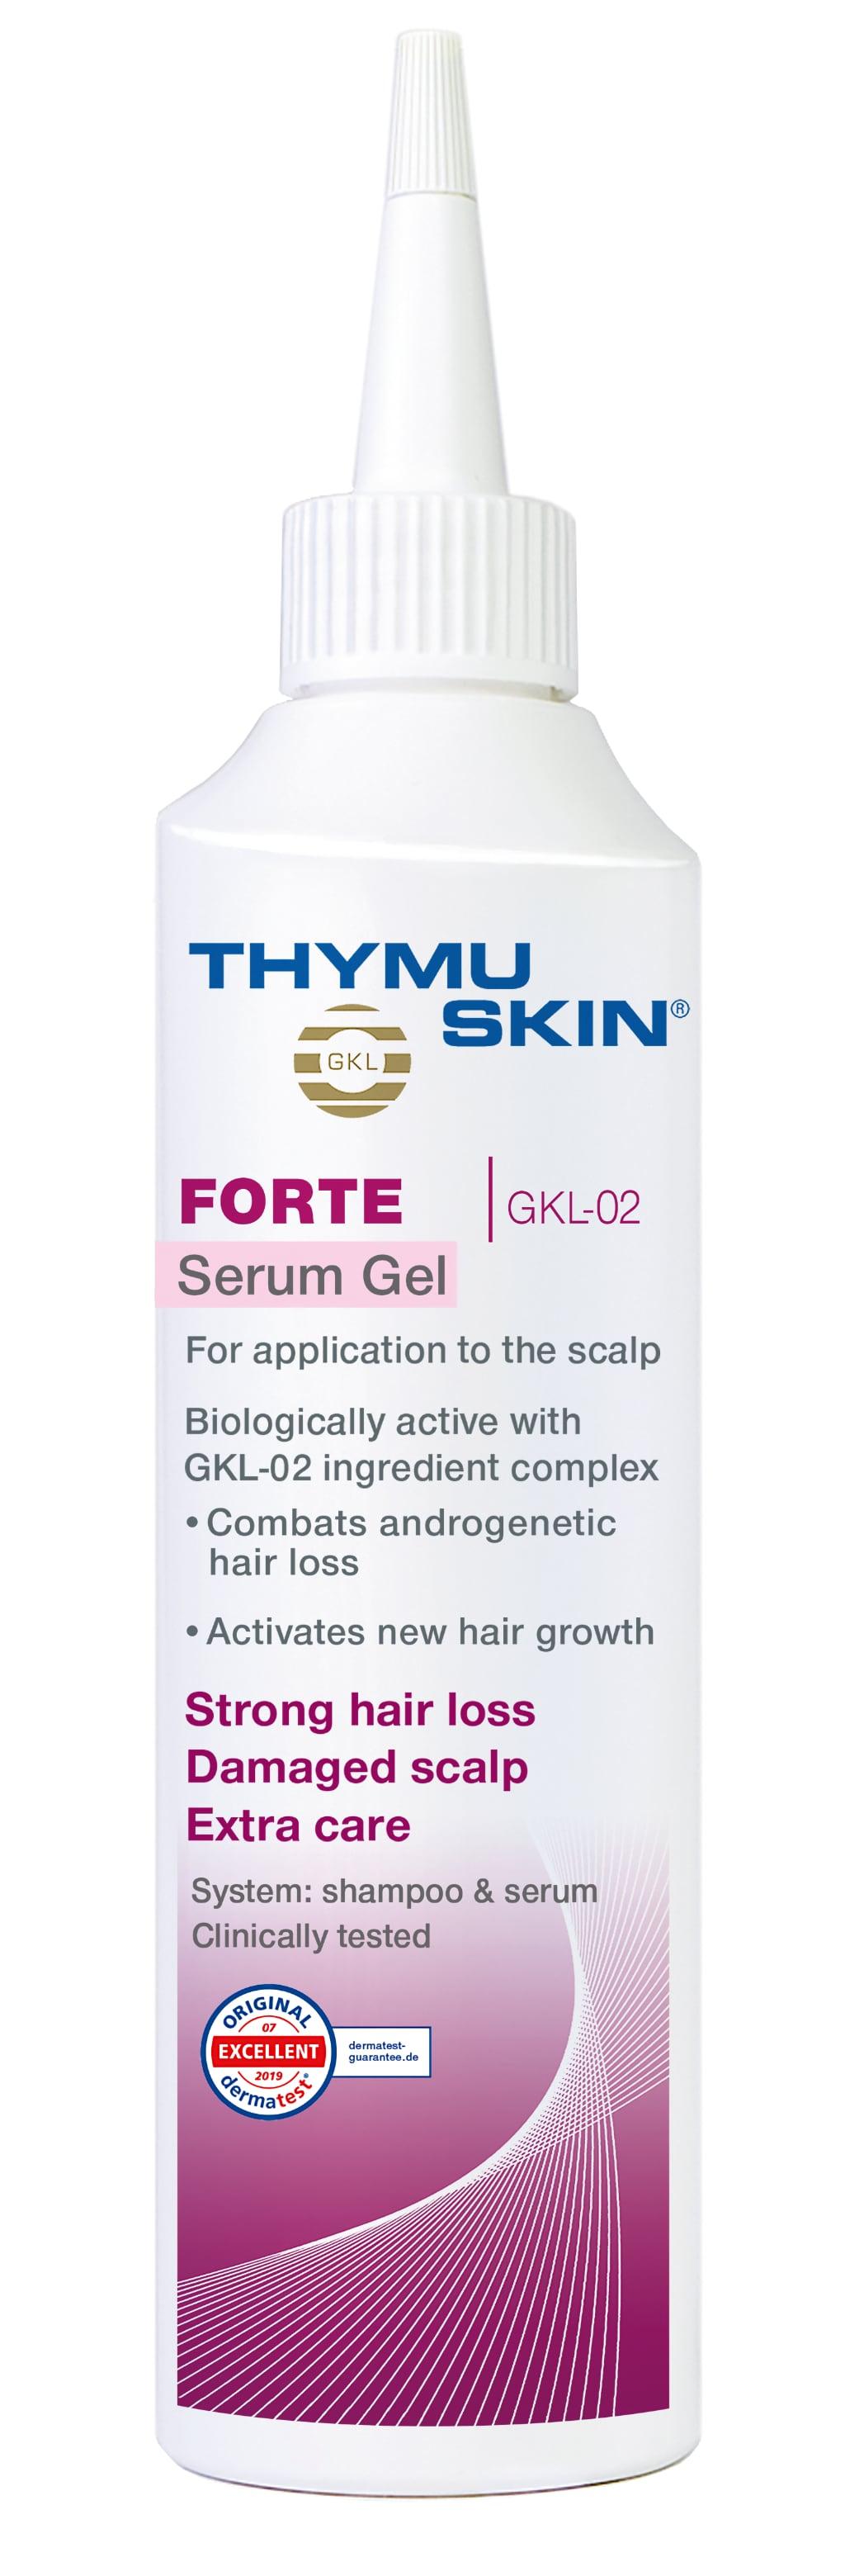 Thymuskin Forte Serum Gel